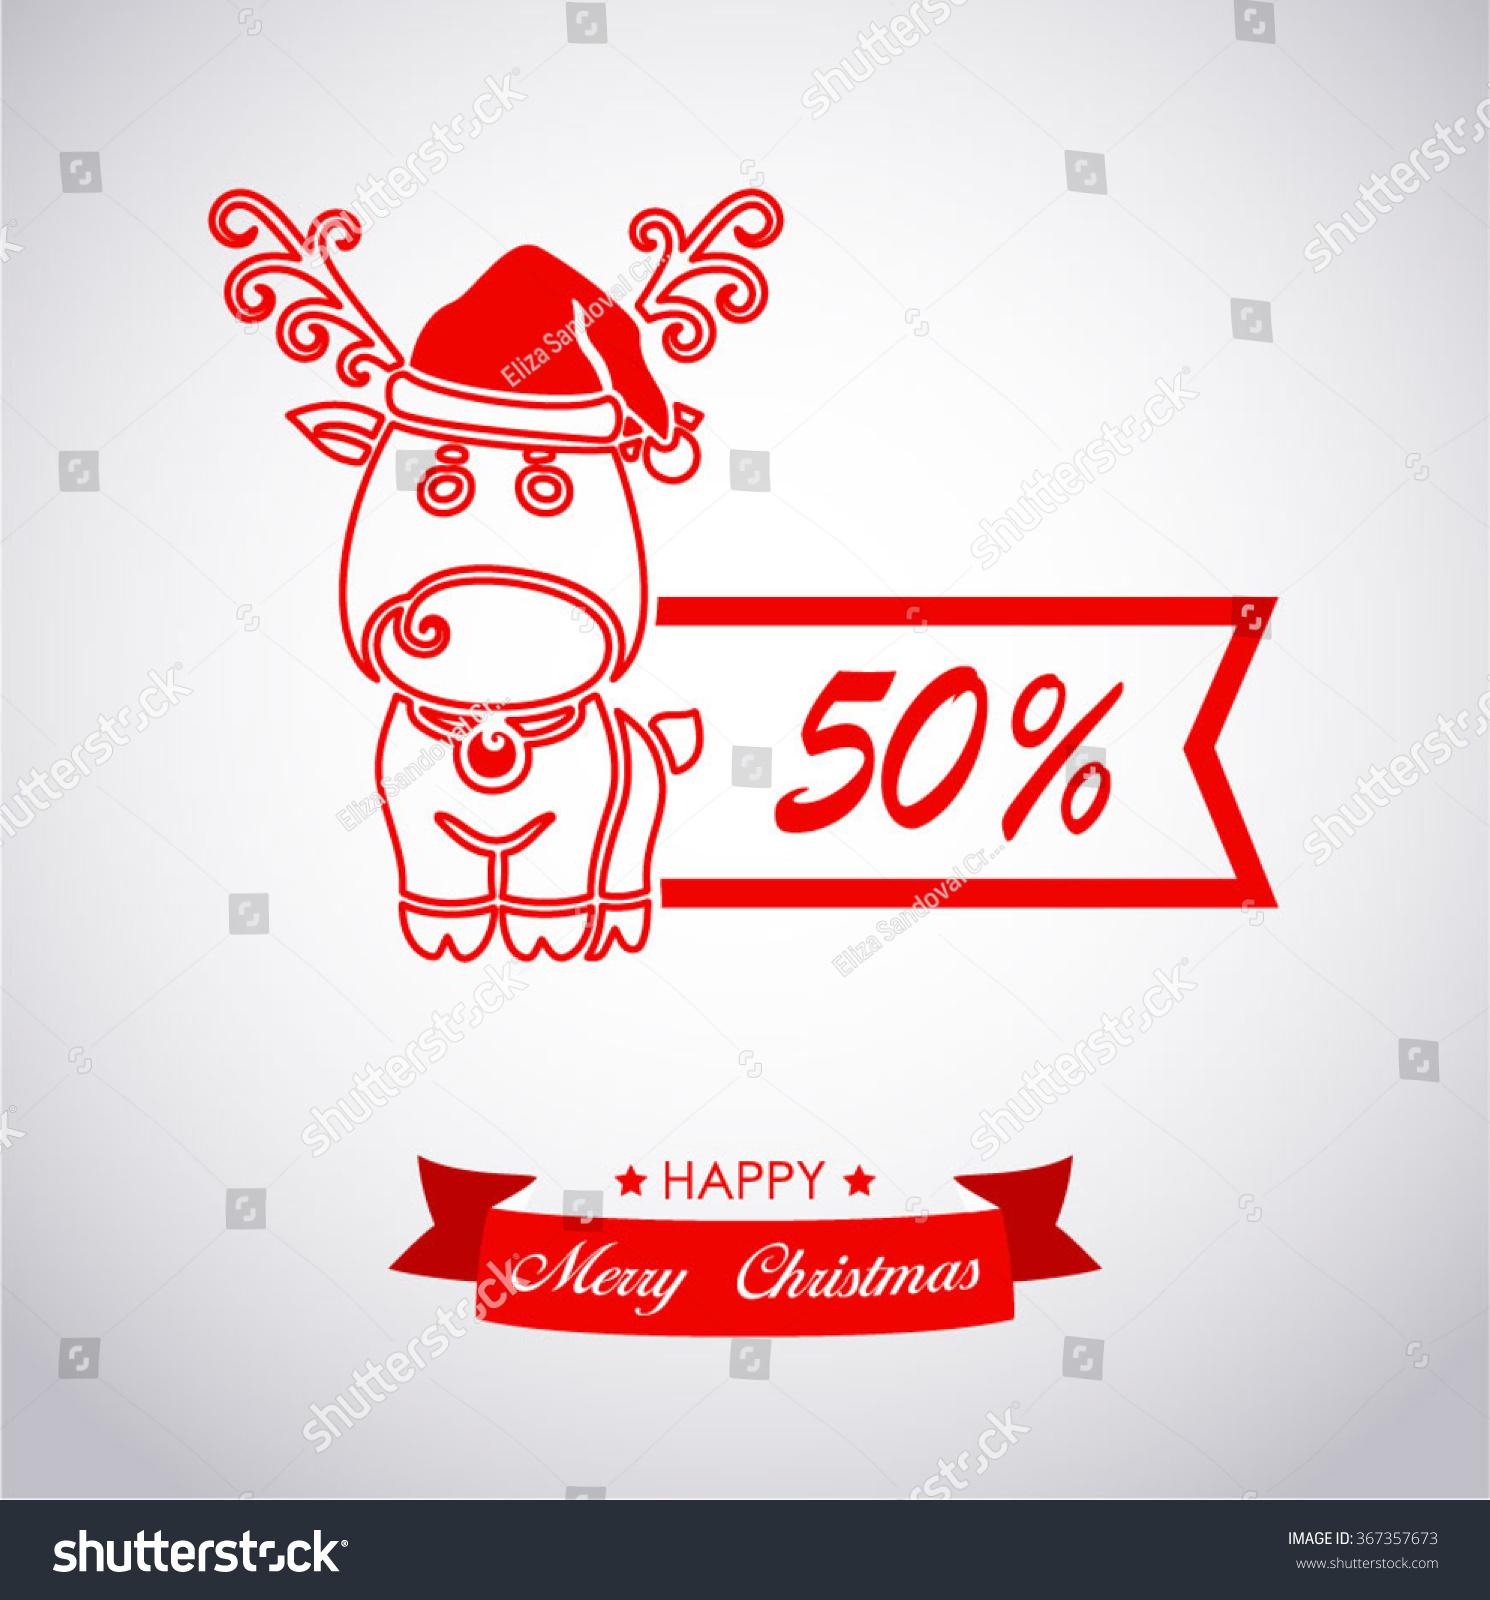 discount christmas reindeer linear stock vector 367357673 shutterstock